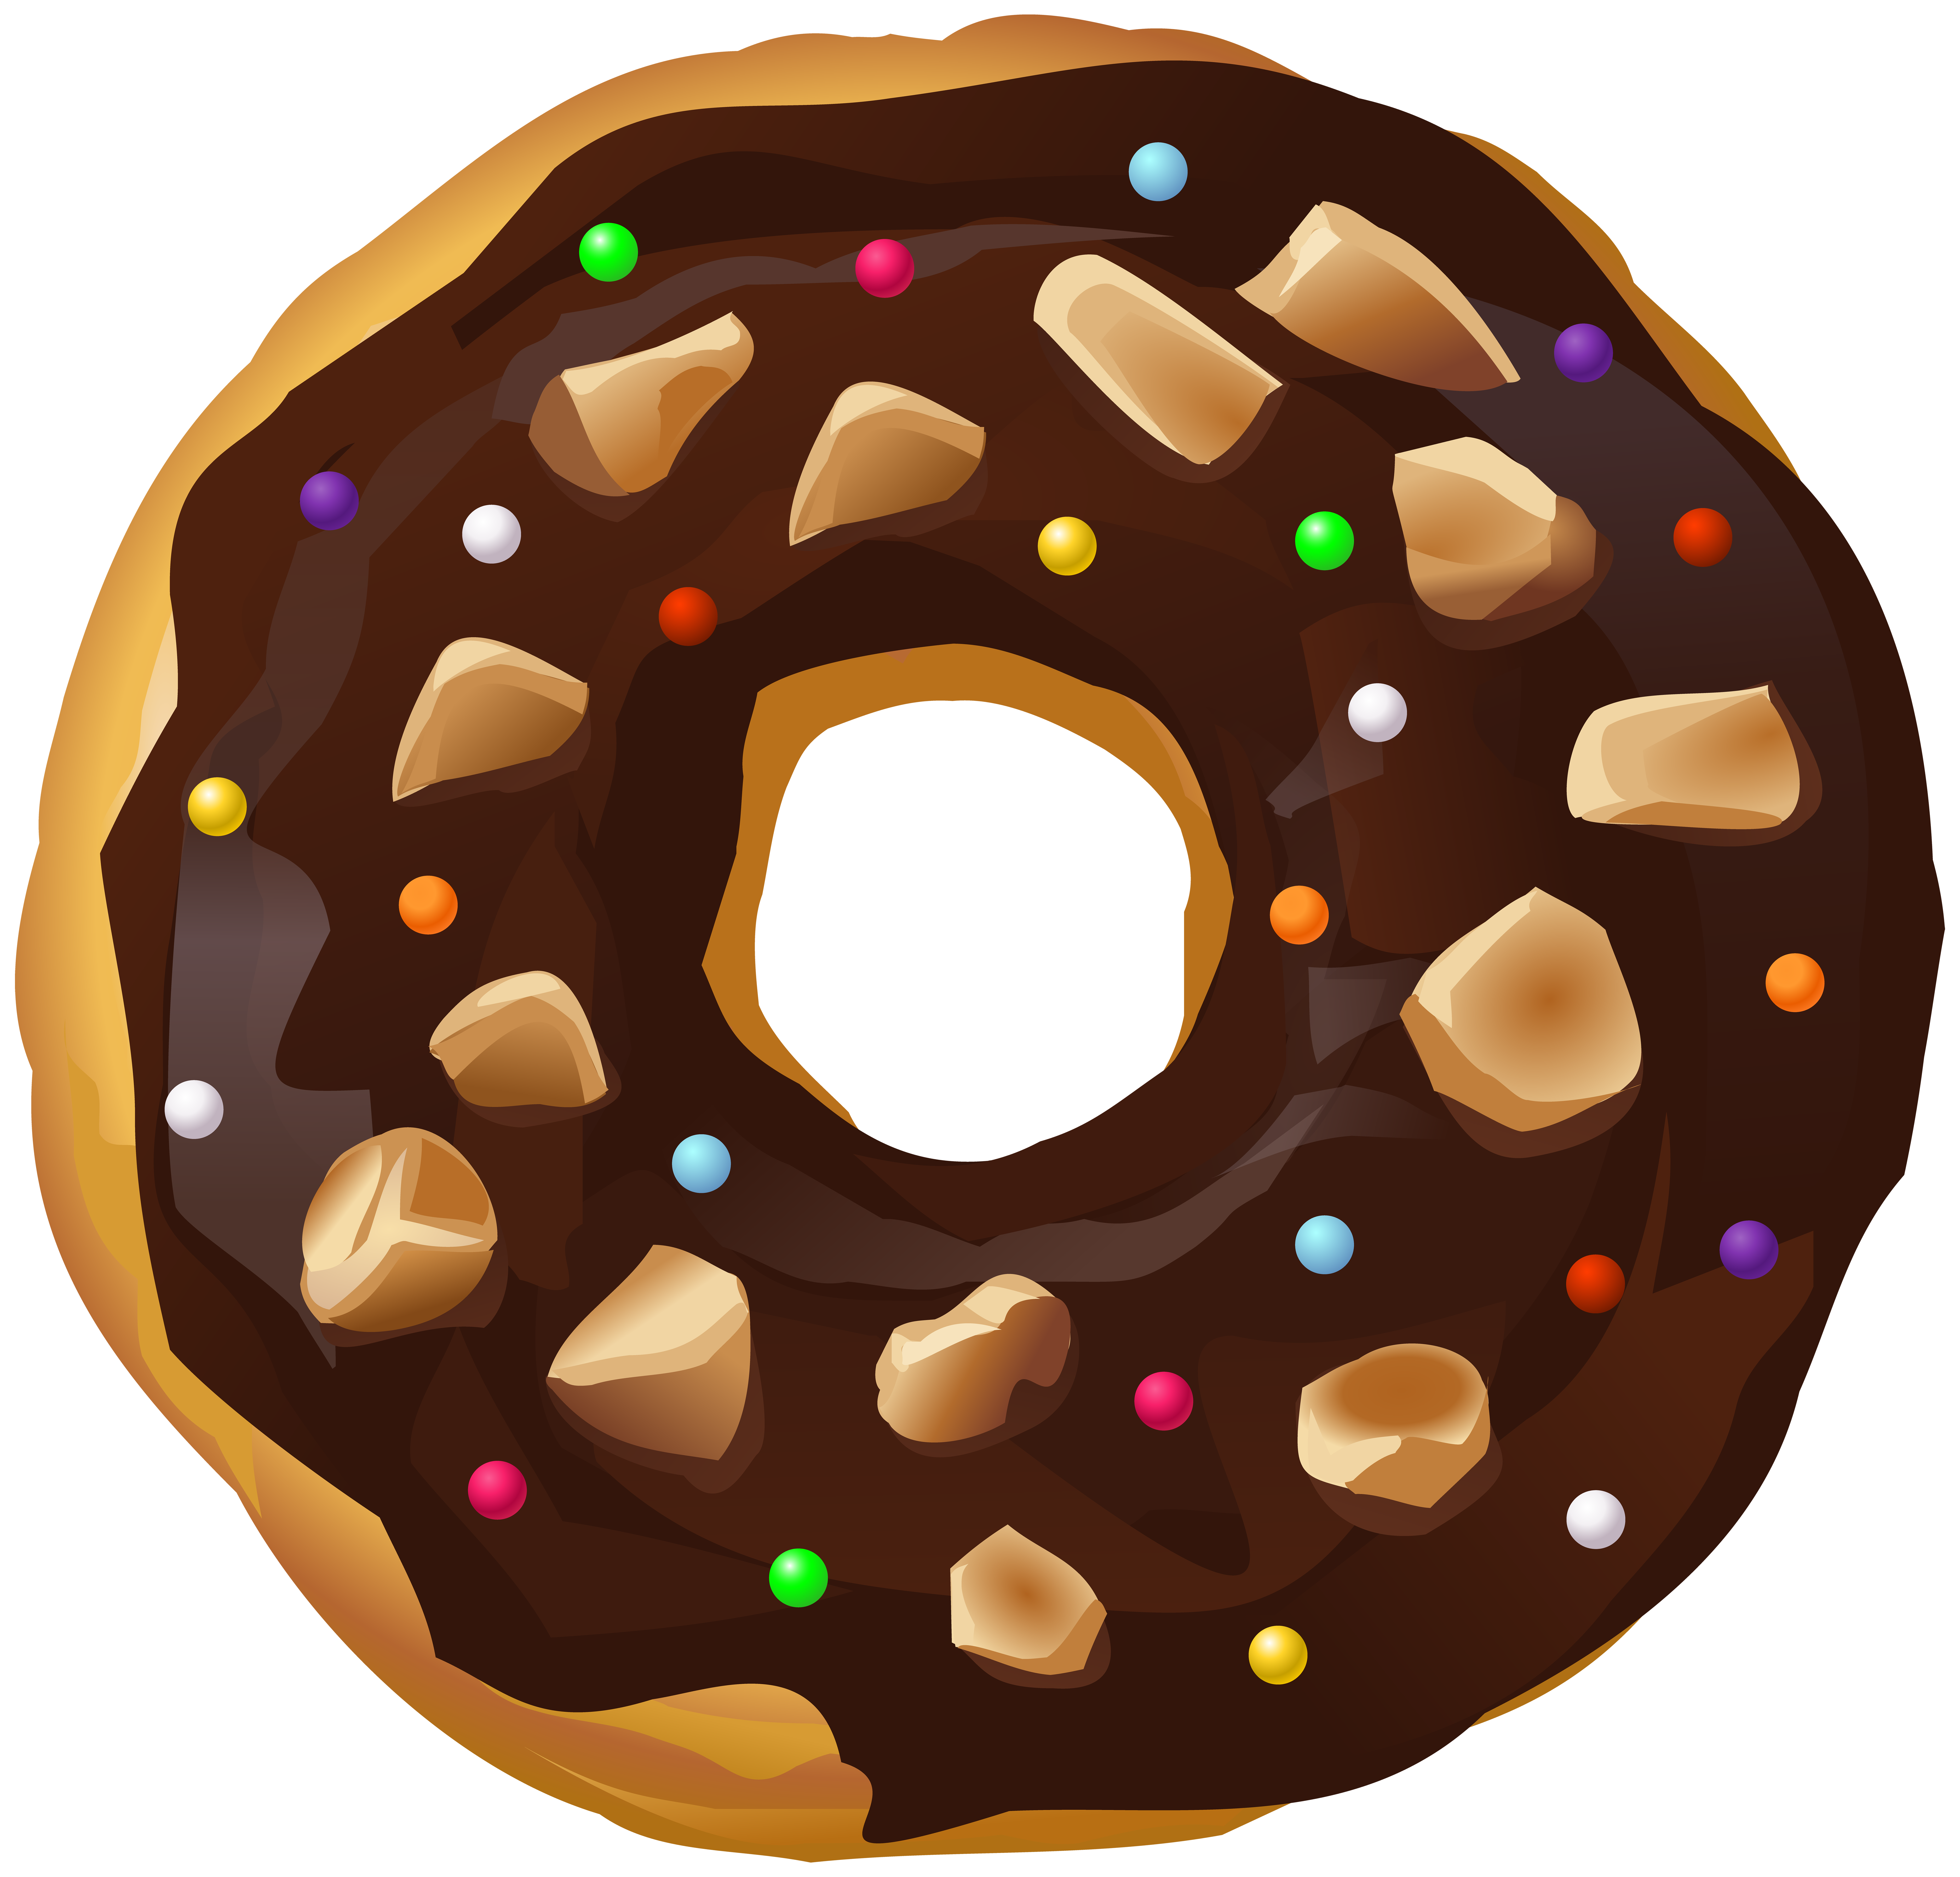 Chocolate Donut Transparent PNG Clip Art Image.